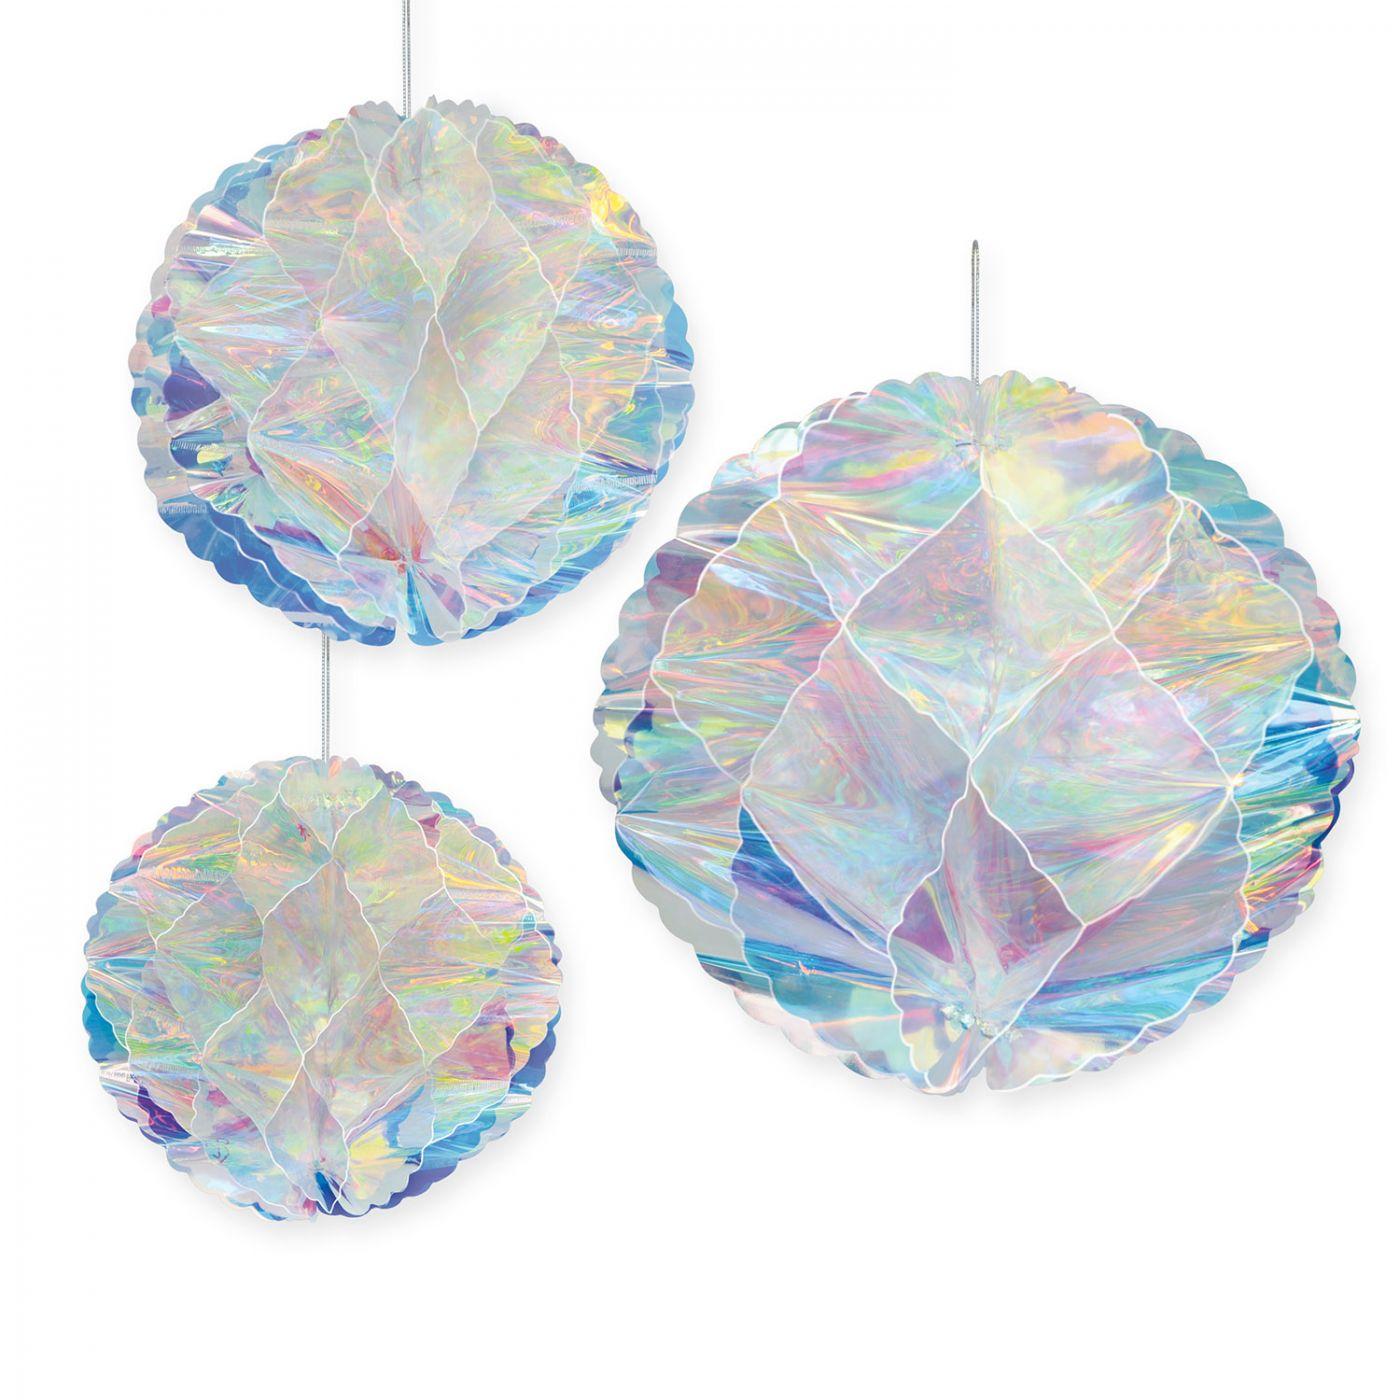 Iridescent Honeycomb Balls (6) image